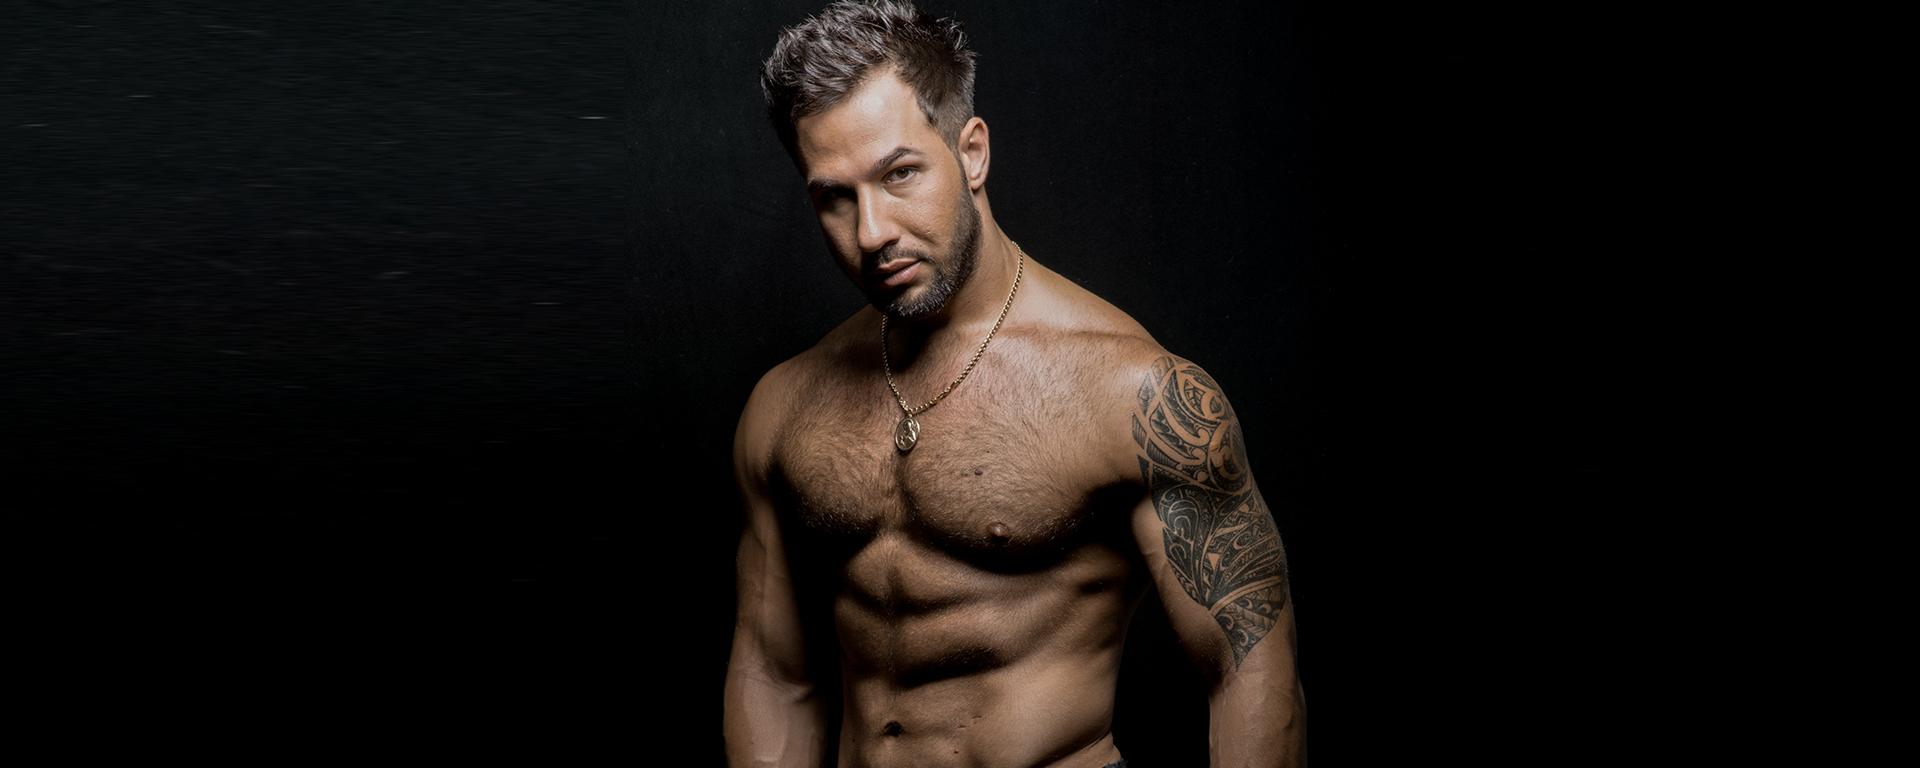 Muscle Men Getting Facials-Porno Pic-5587